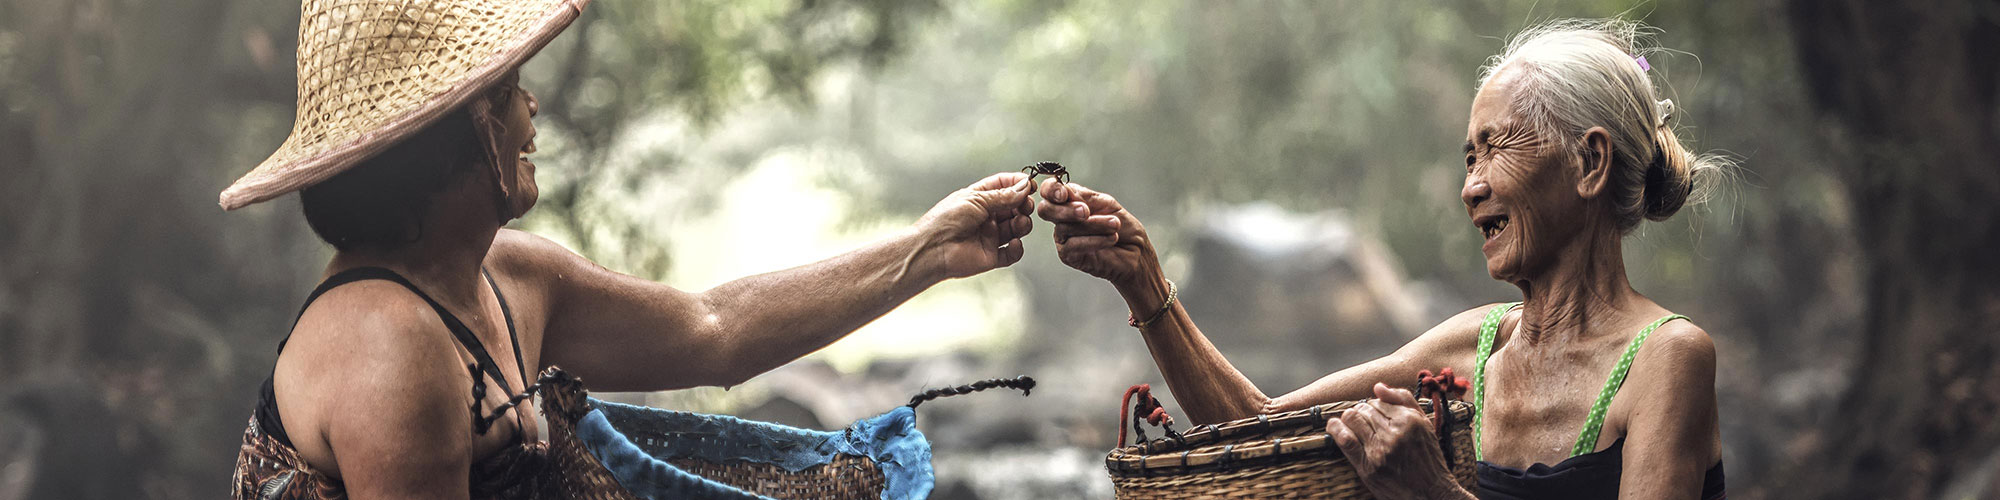 Indonesian Elderly Both Holding Crab